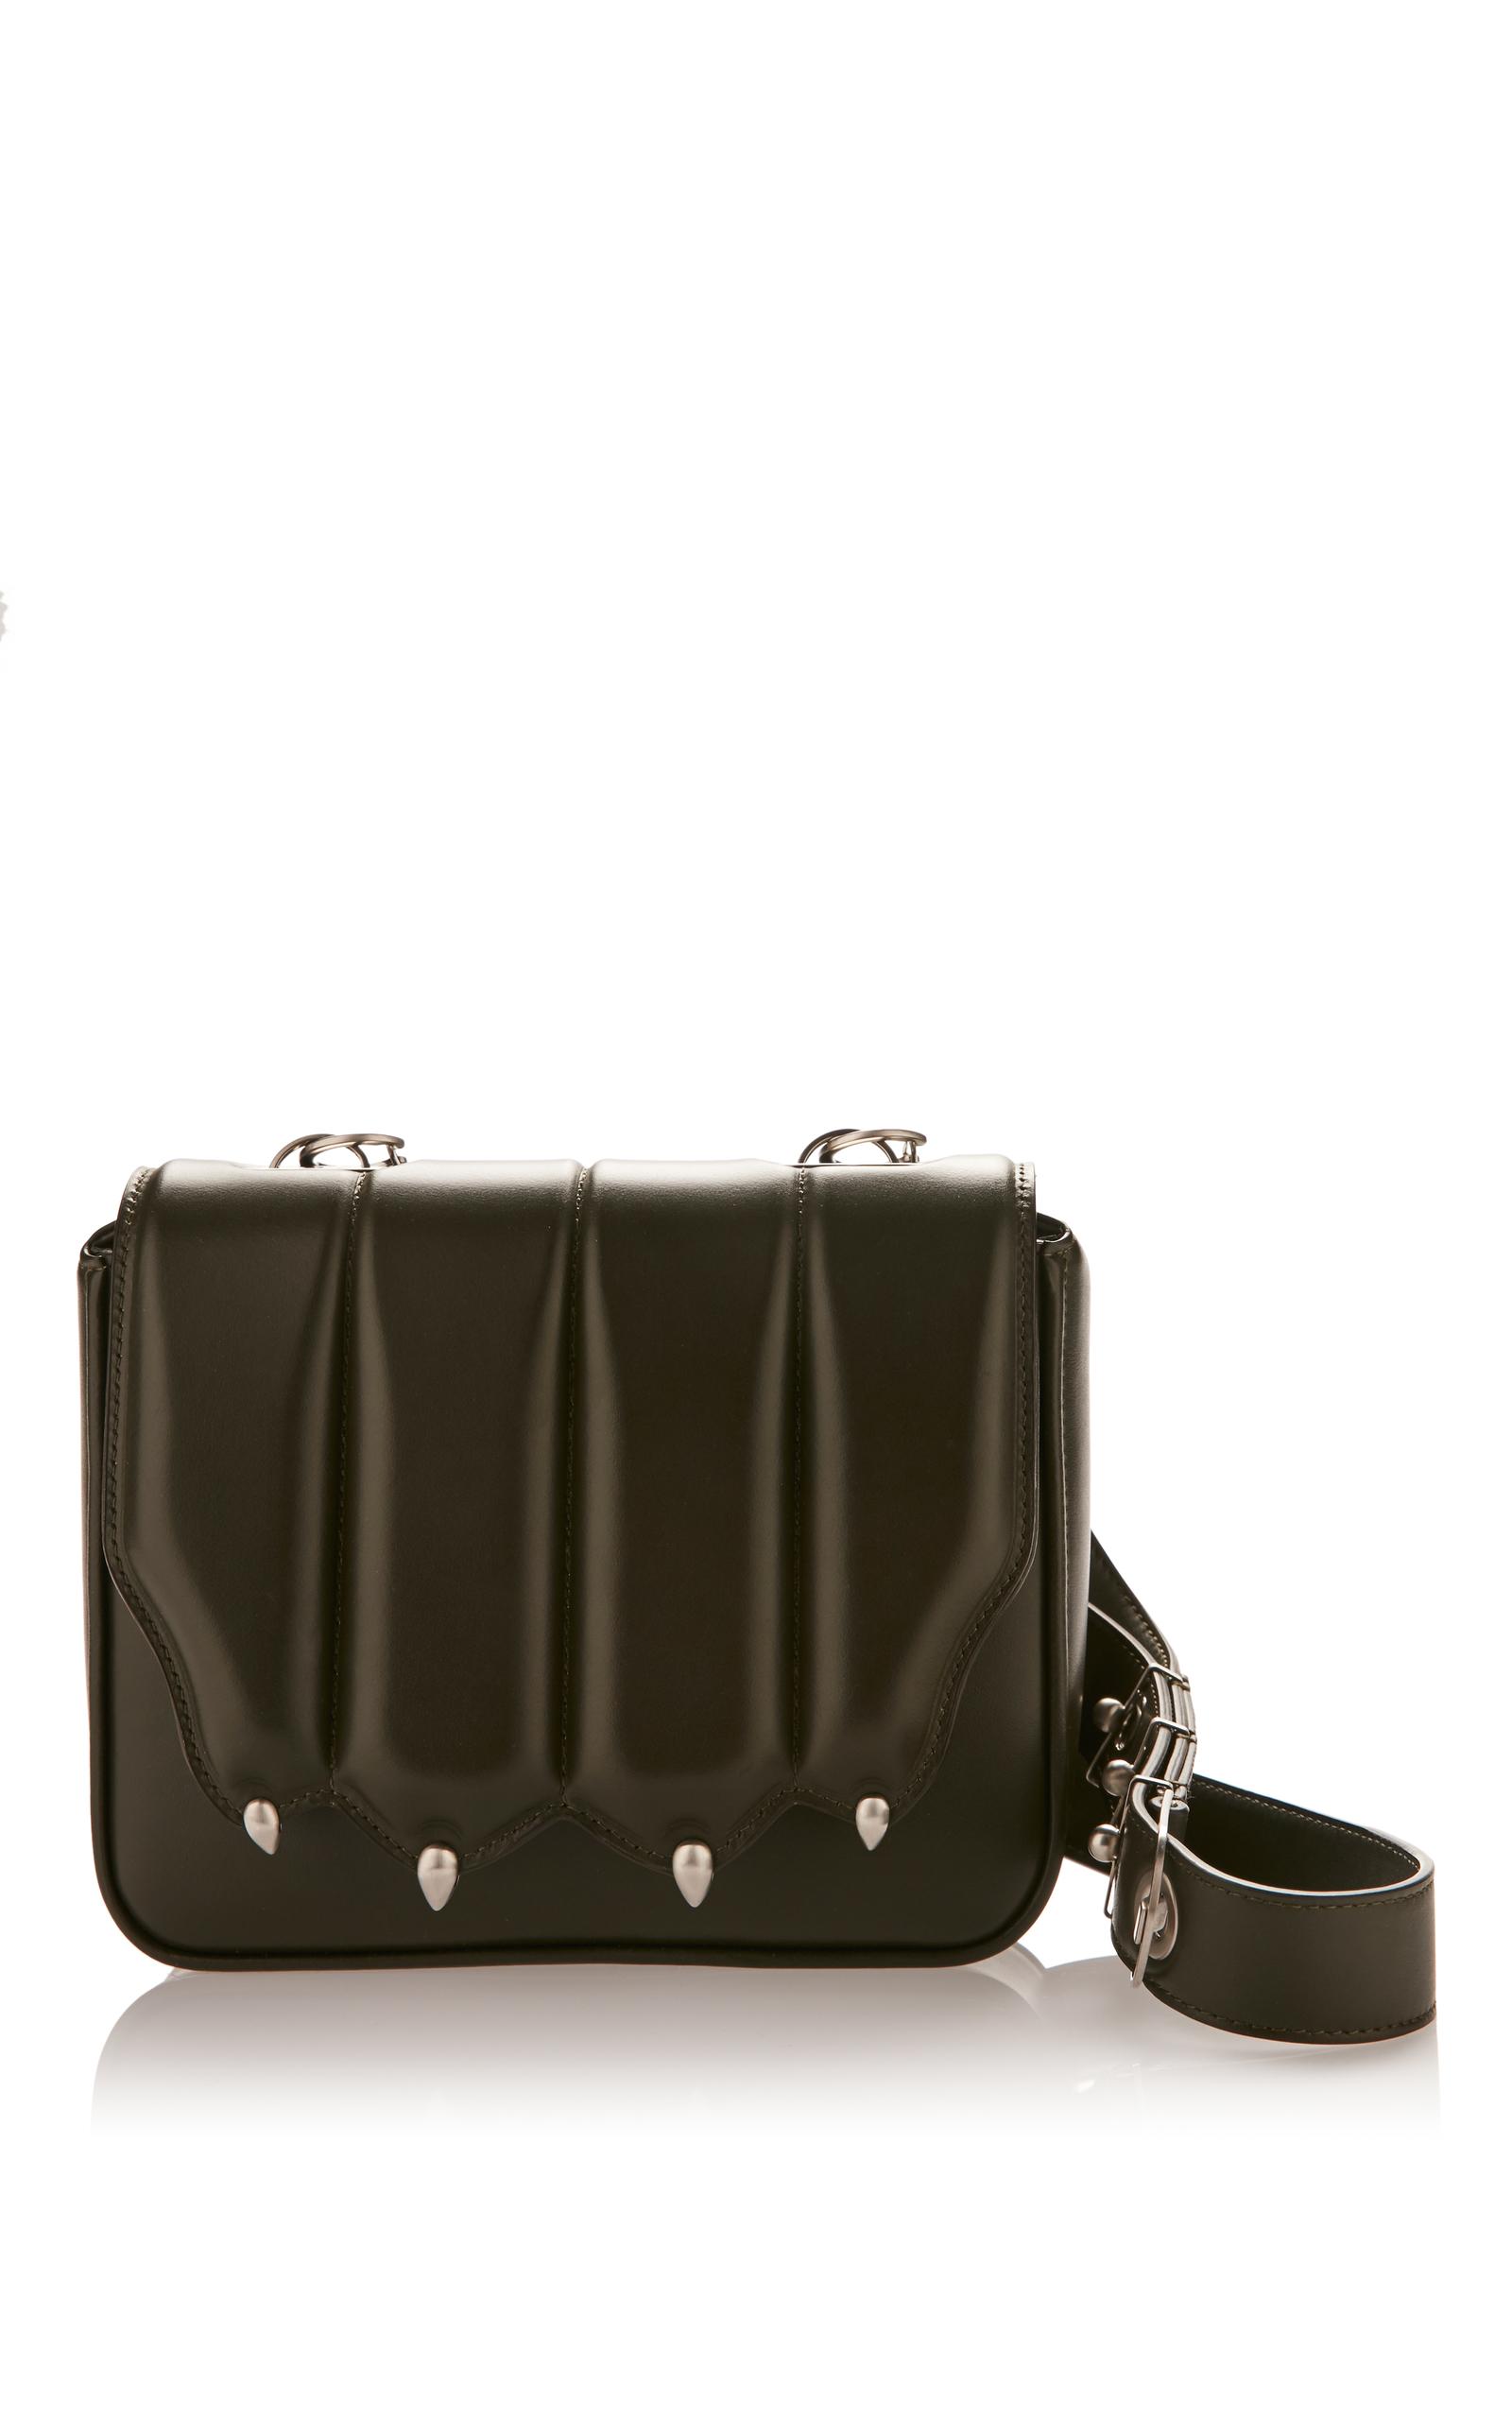 Bag Operandi By Marco Claw De Moda Vincenzo Shoulder 0wEFqW5S